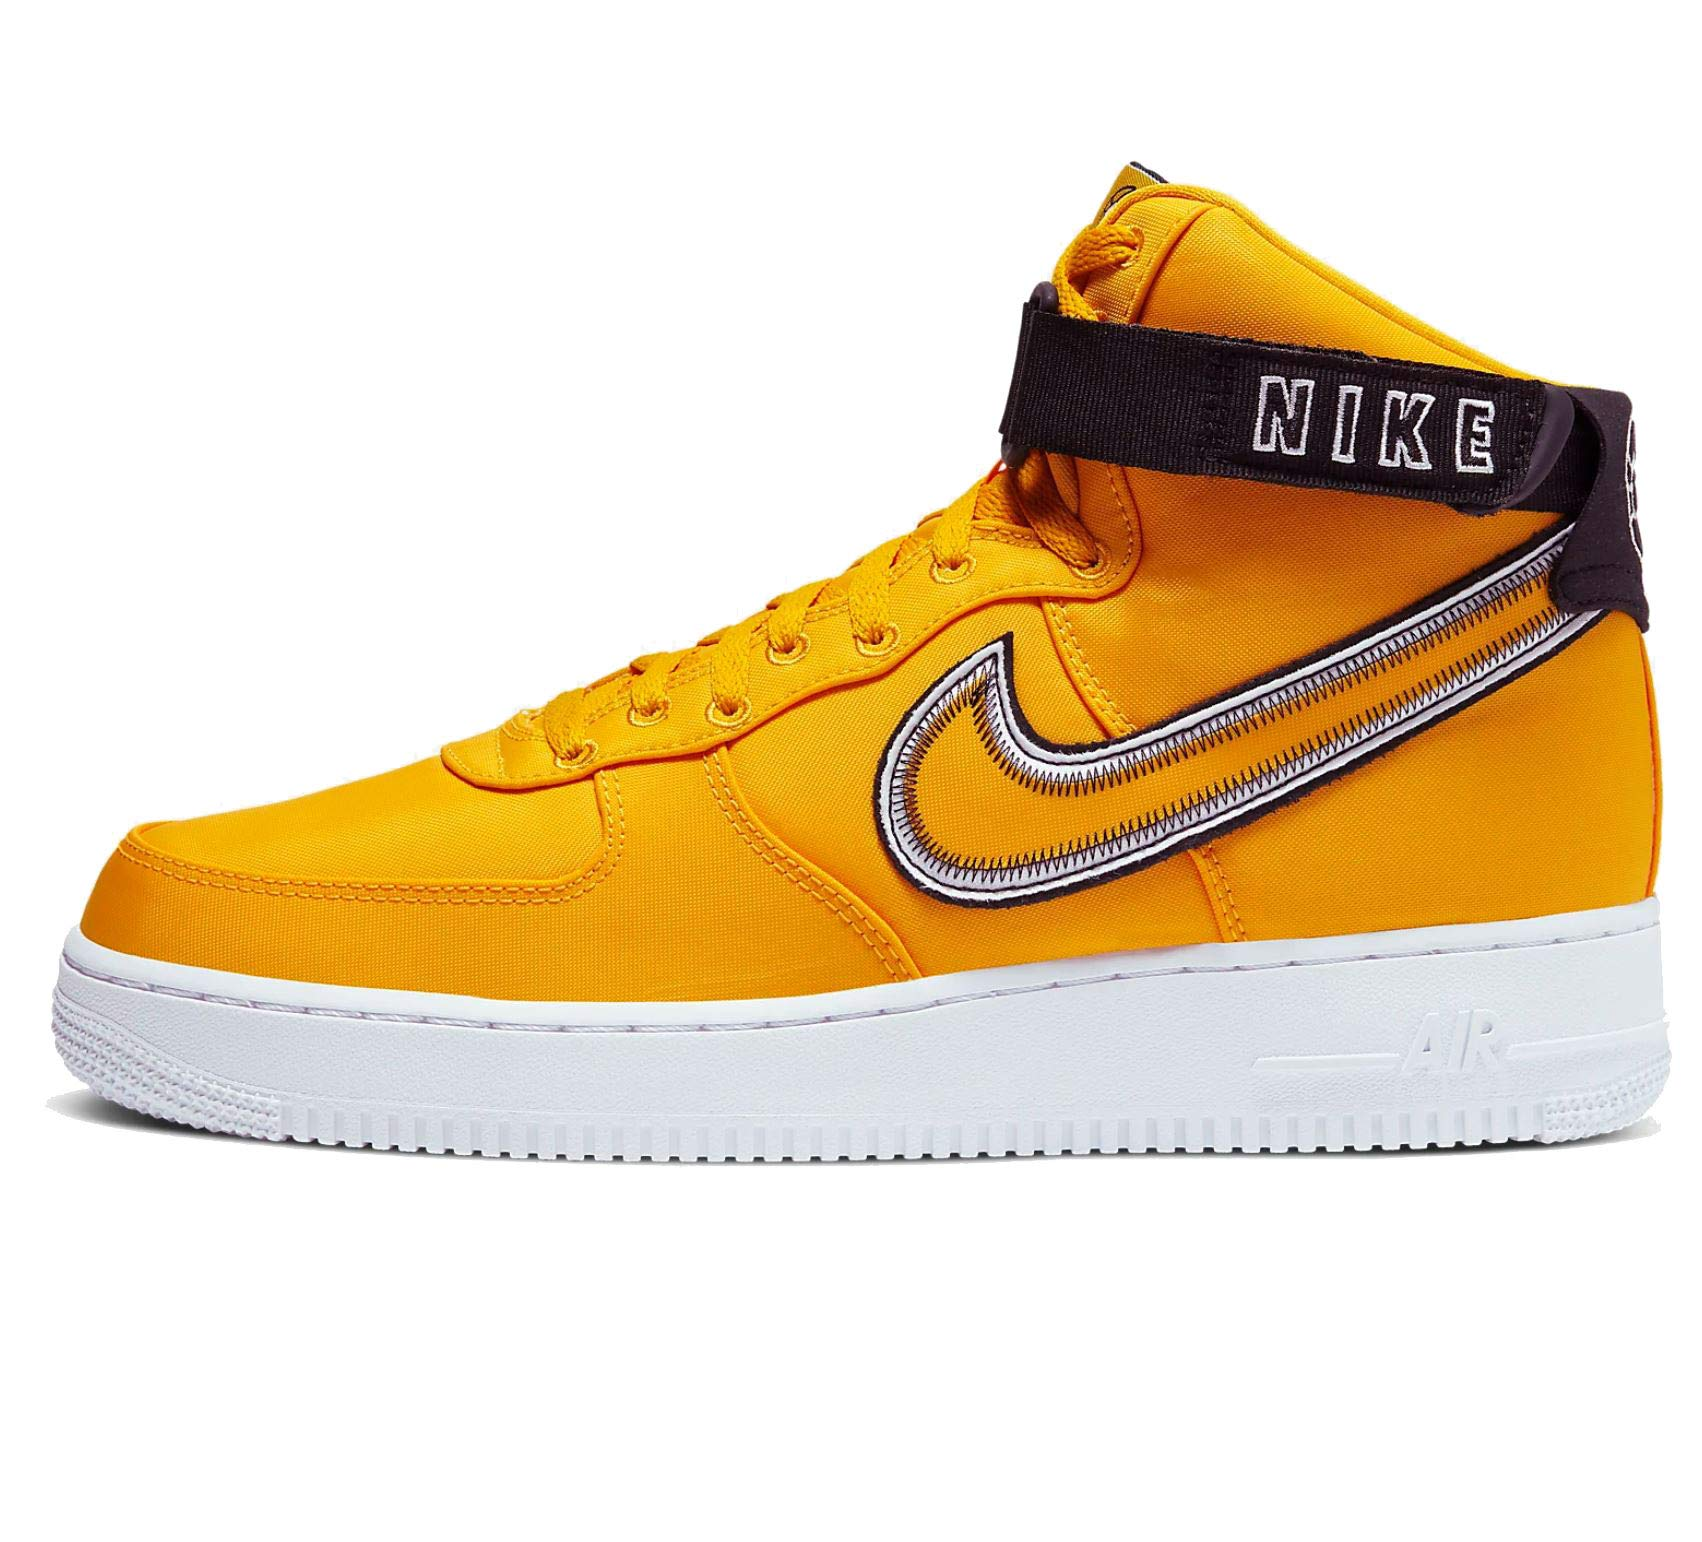 Nike Air Force 1 High '07 Lv8 Mens